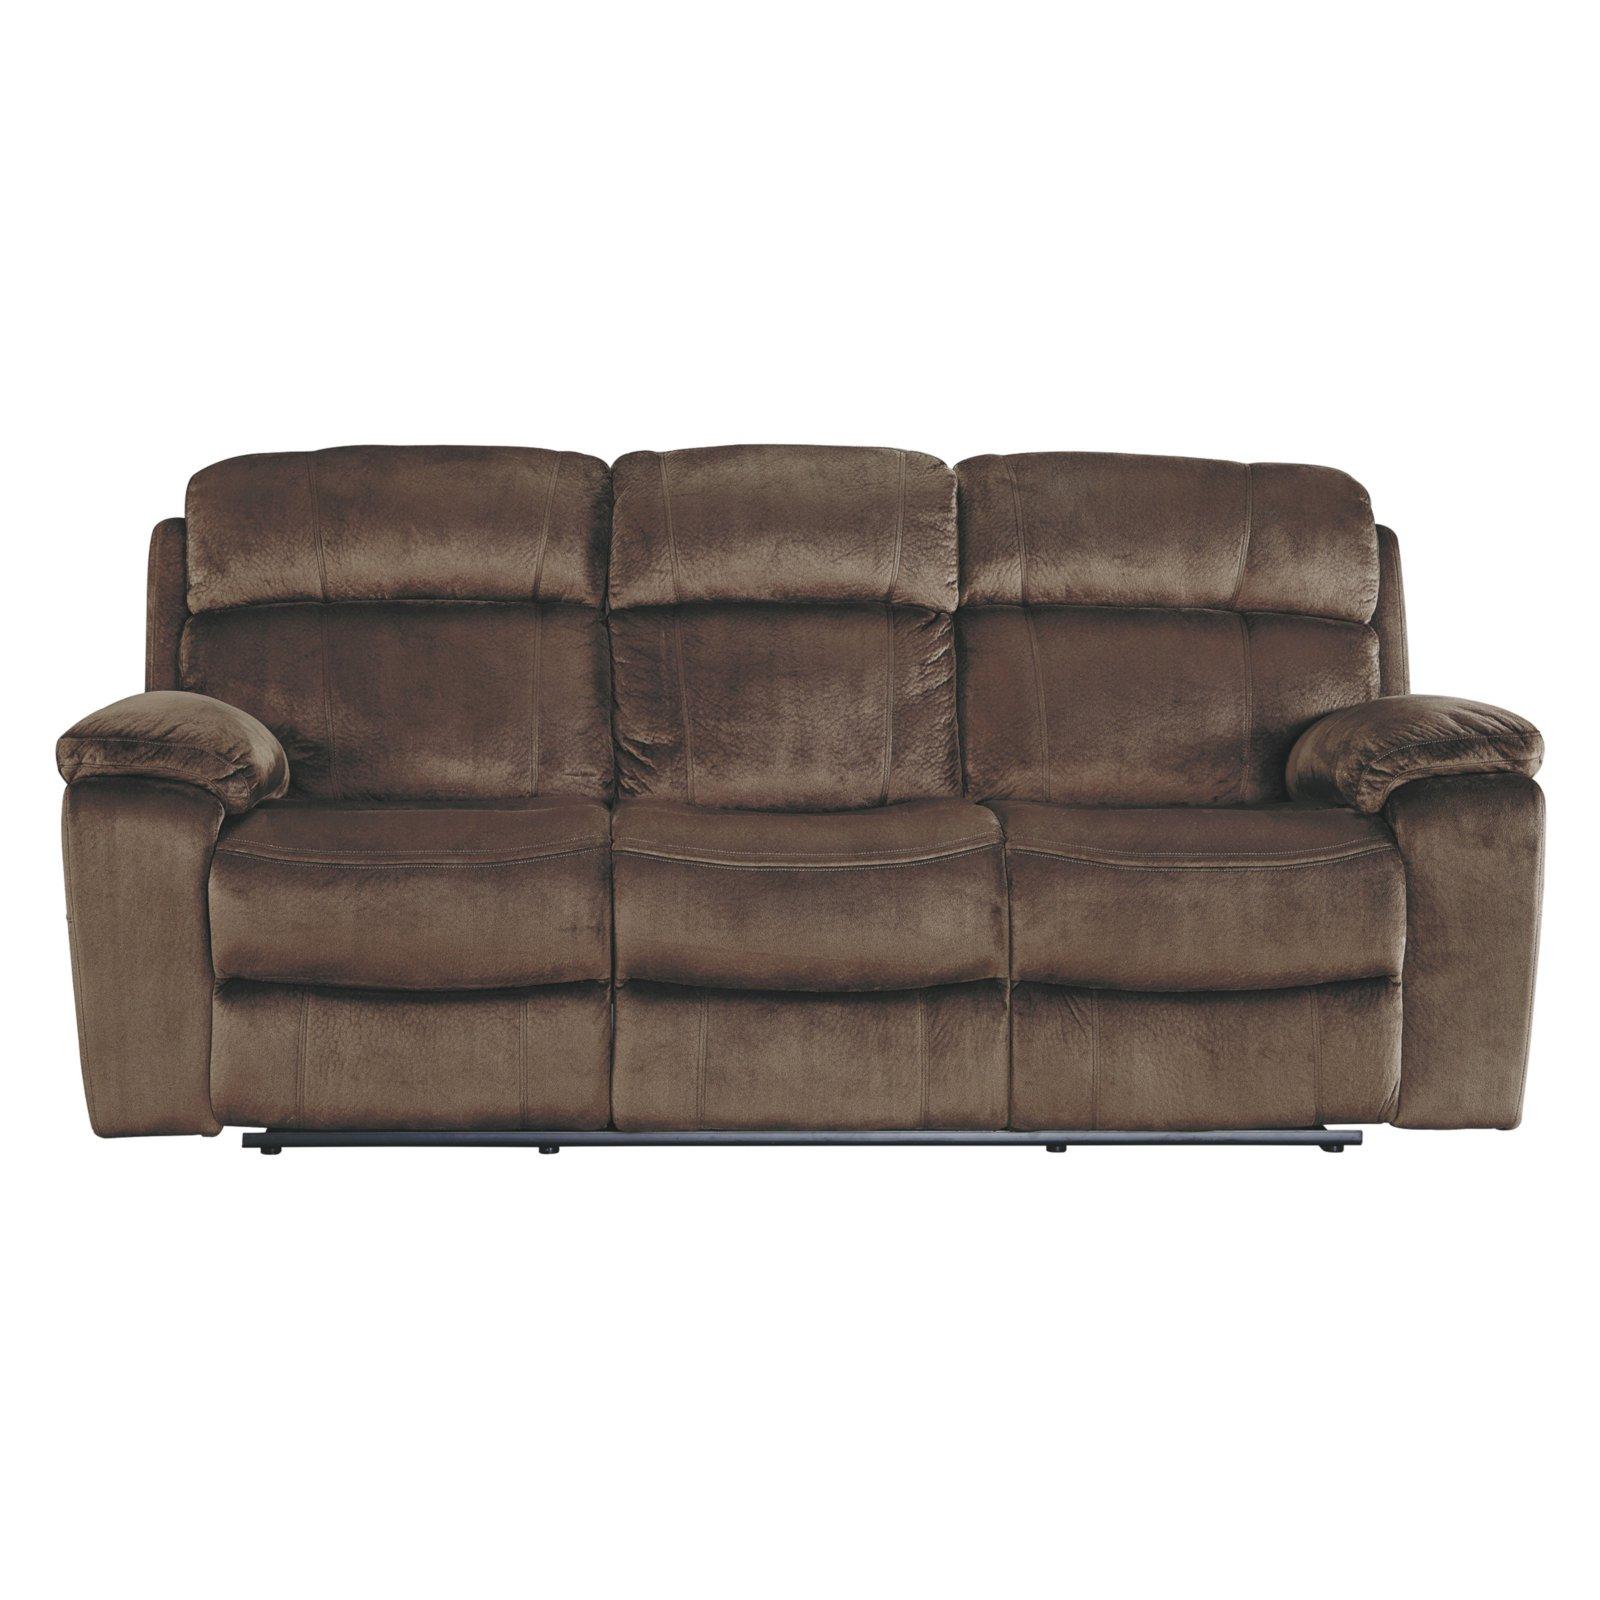 Fabulous Signature Design By Ashley Uhland Power Reclining Sofa Interior Design Ideas Gentotthenellocom